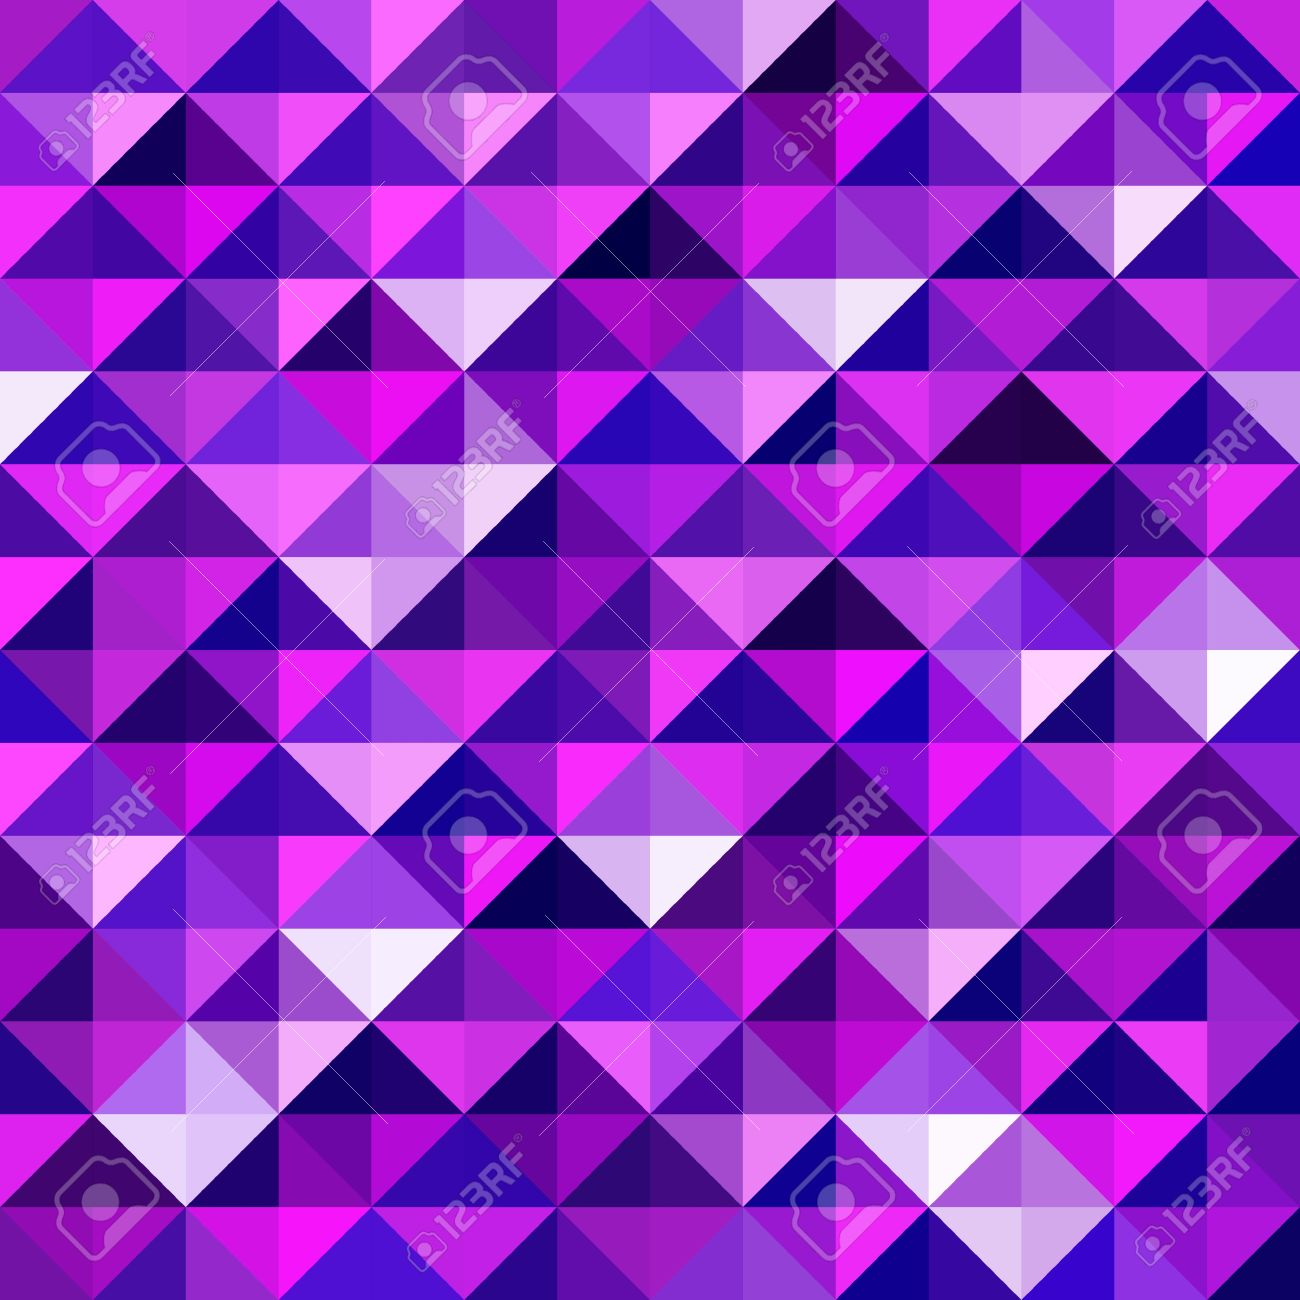 mosaic design background abstract pattern art wallpaper